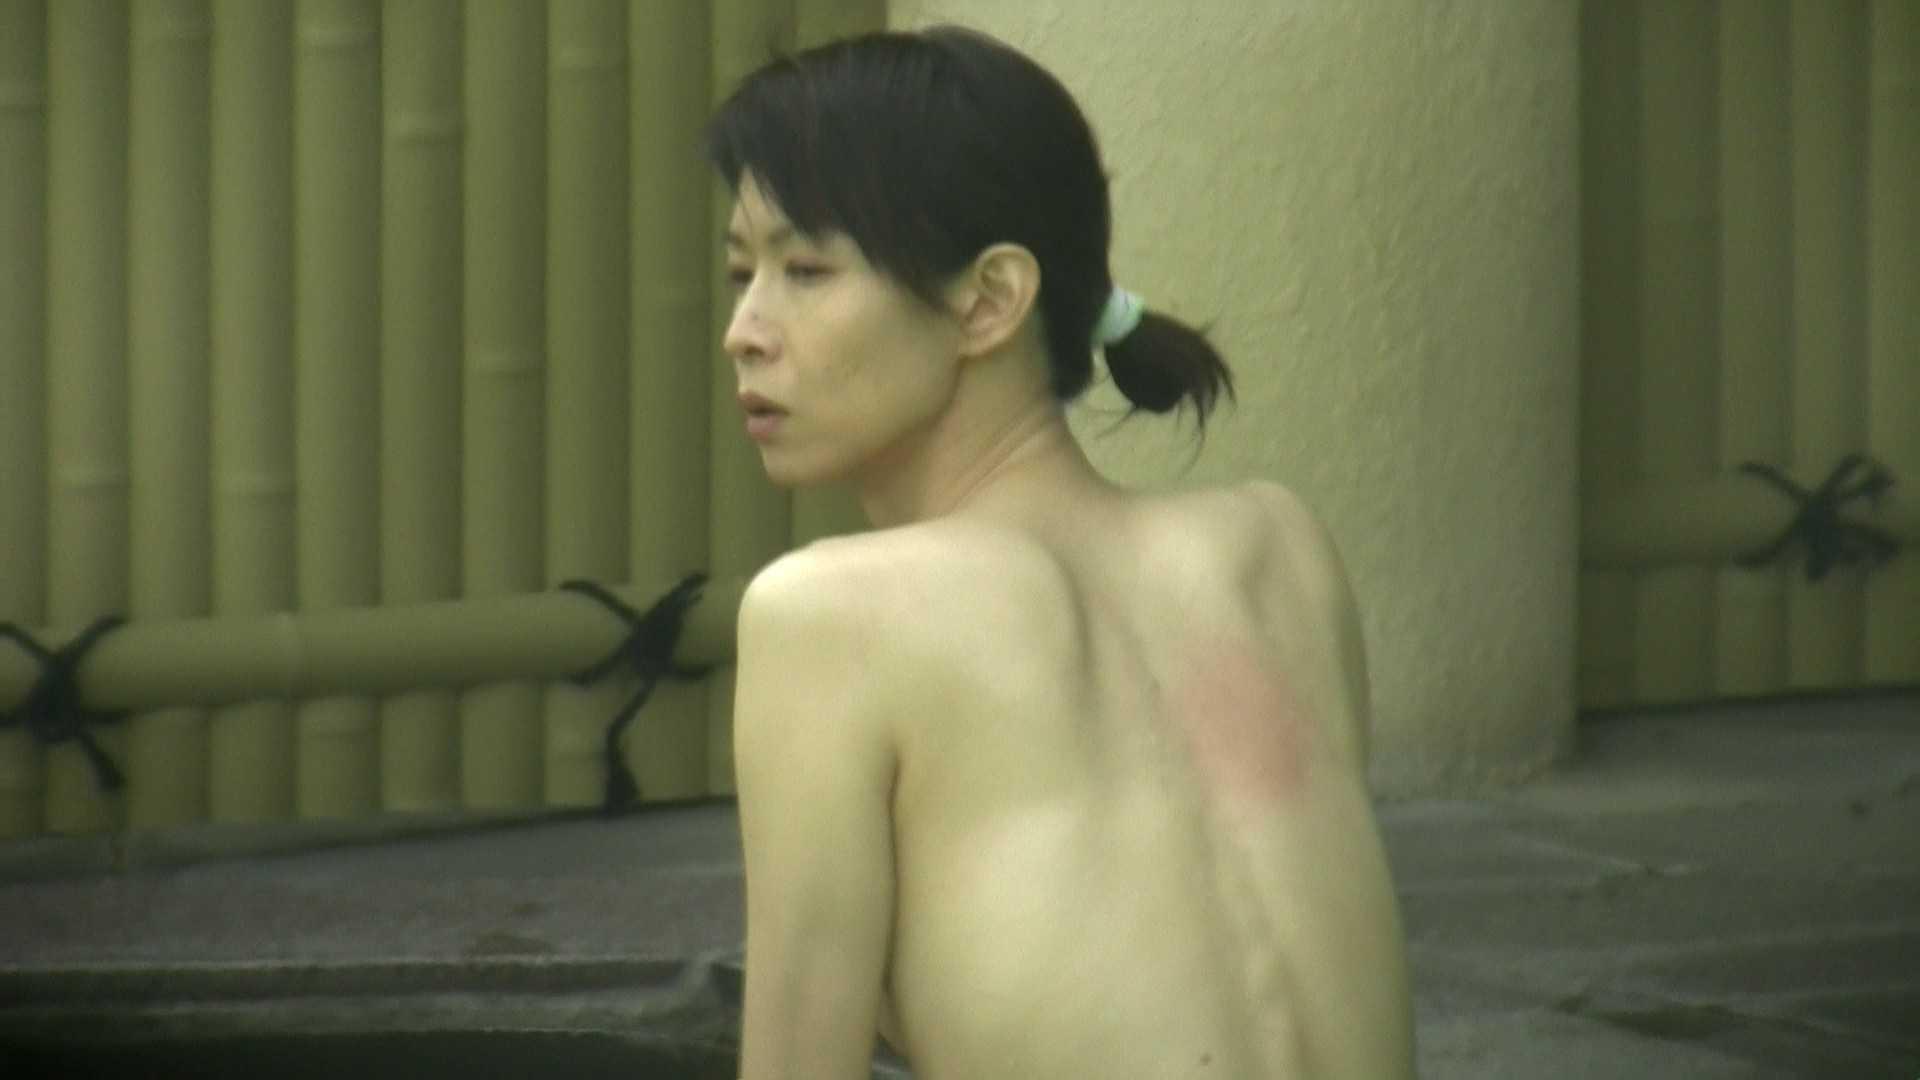 Aquaな露天風呂Vol.631 盗撮  109連発 63